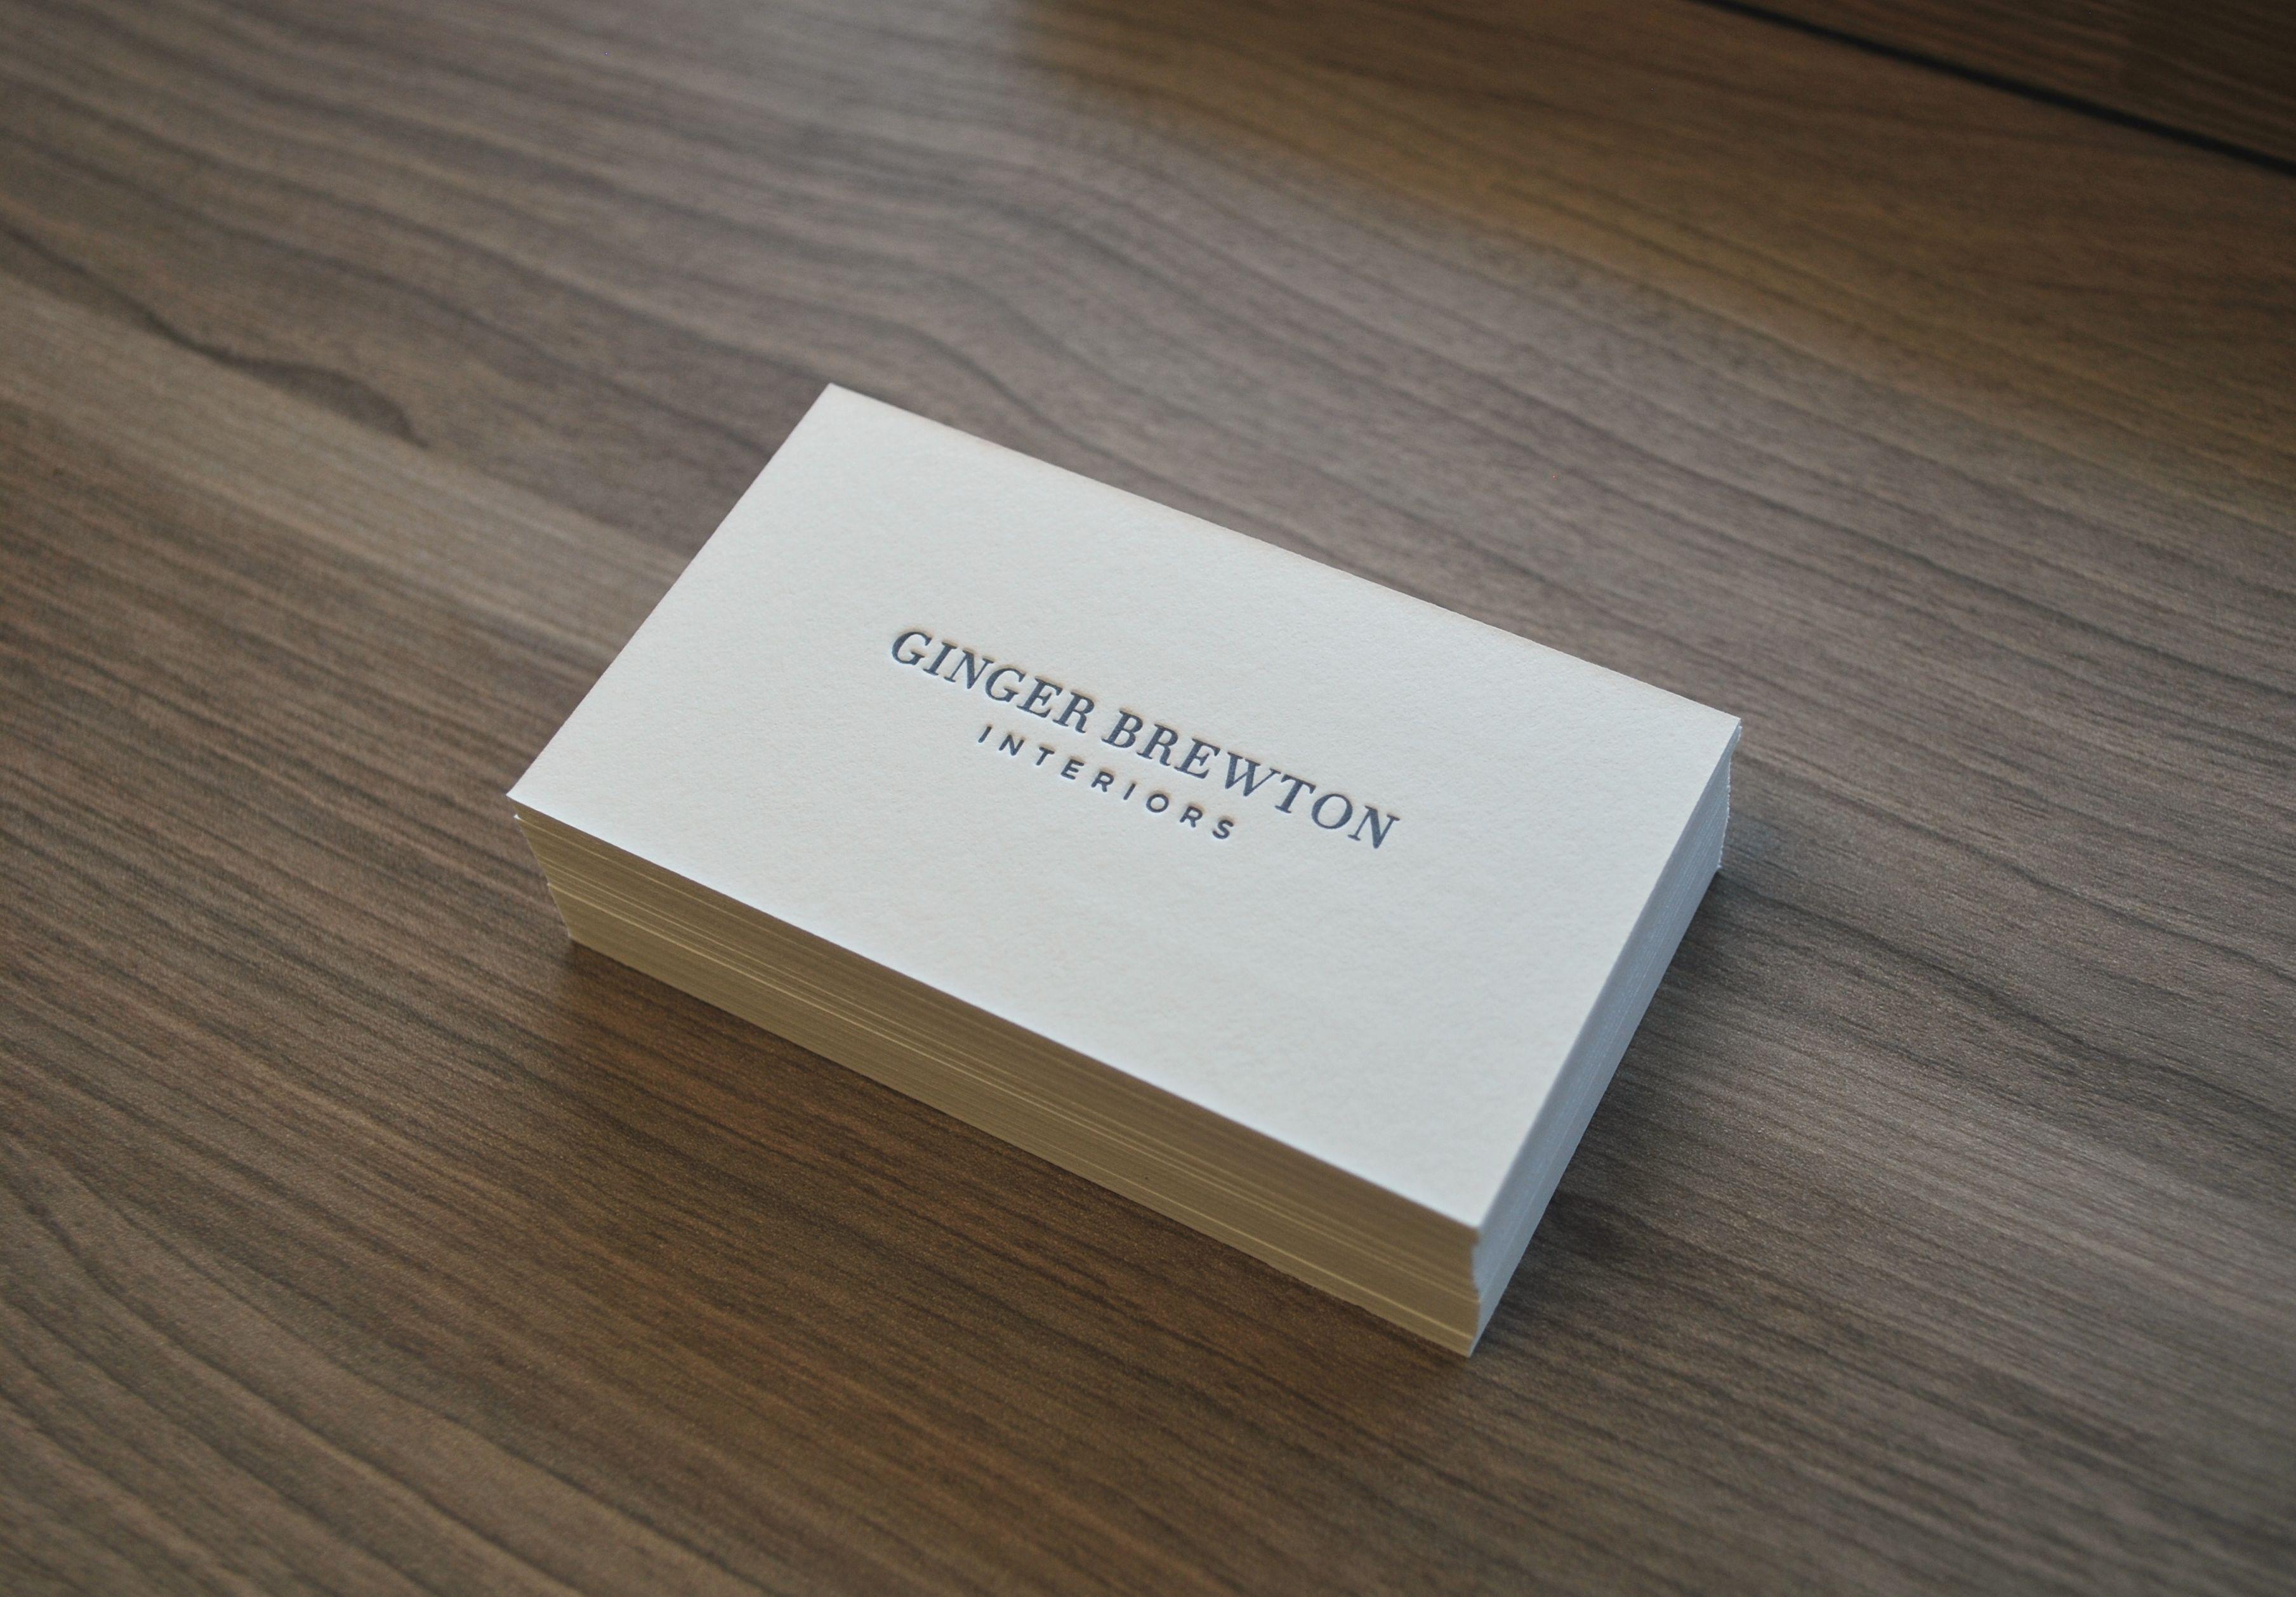 letterpress business card design for our client ginger brewton